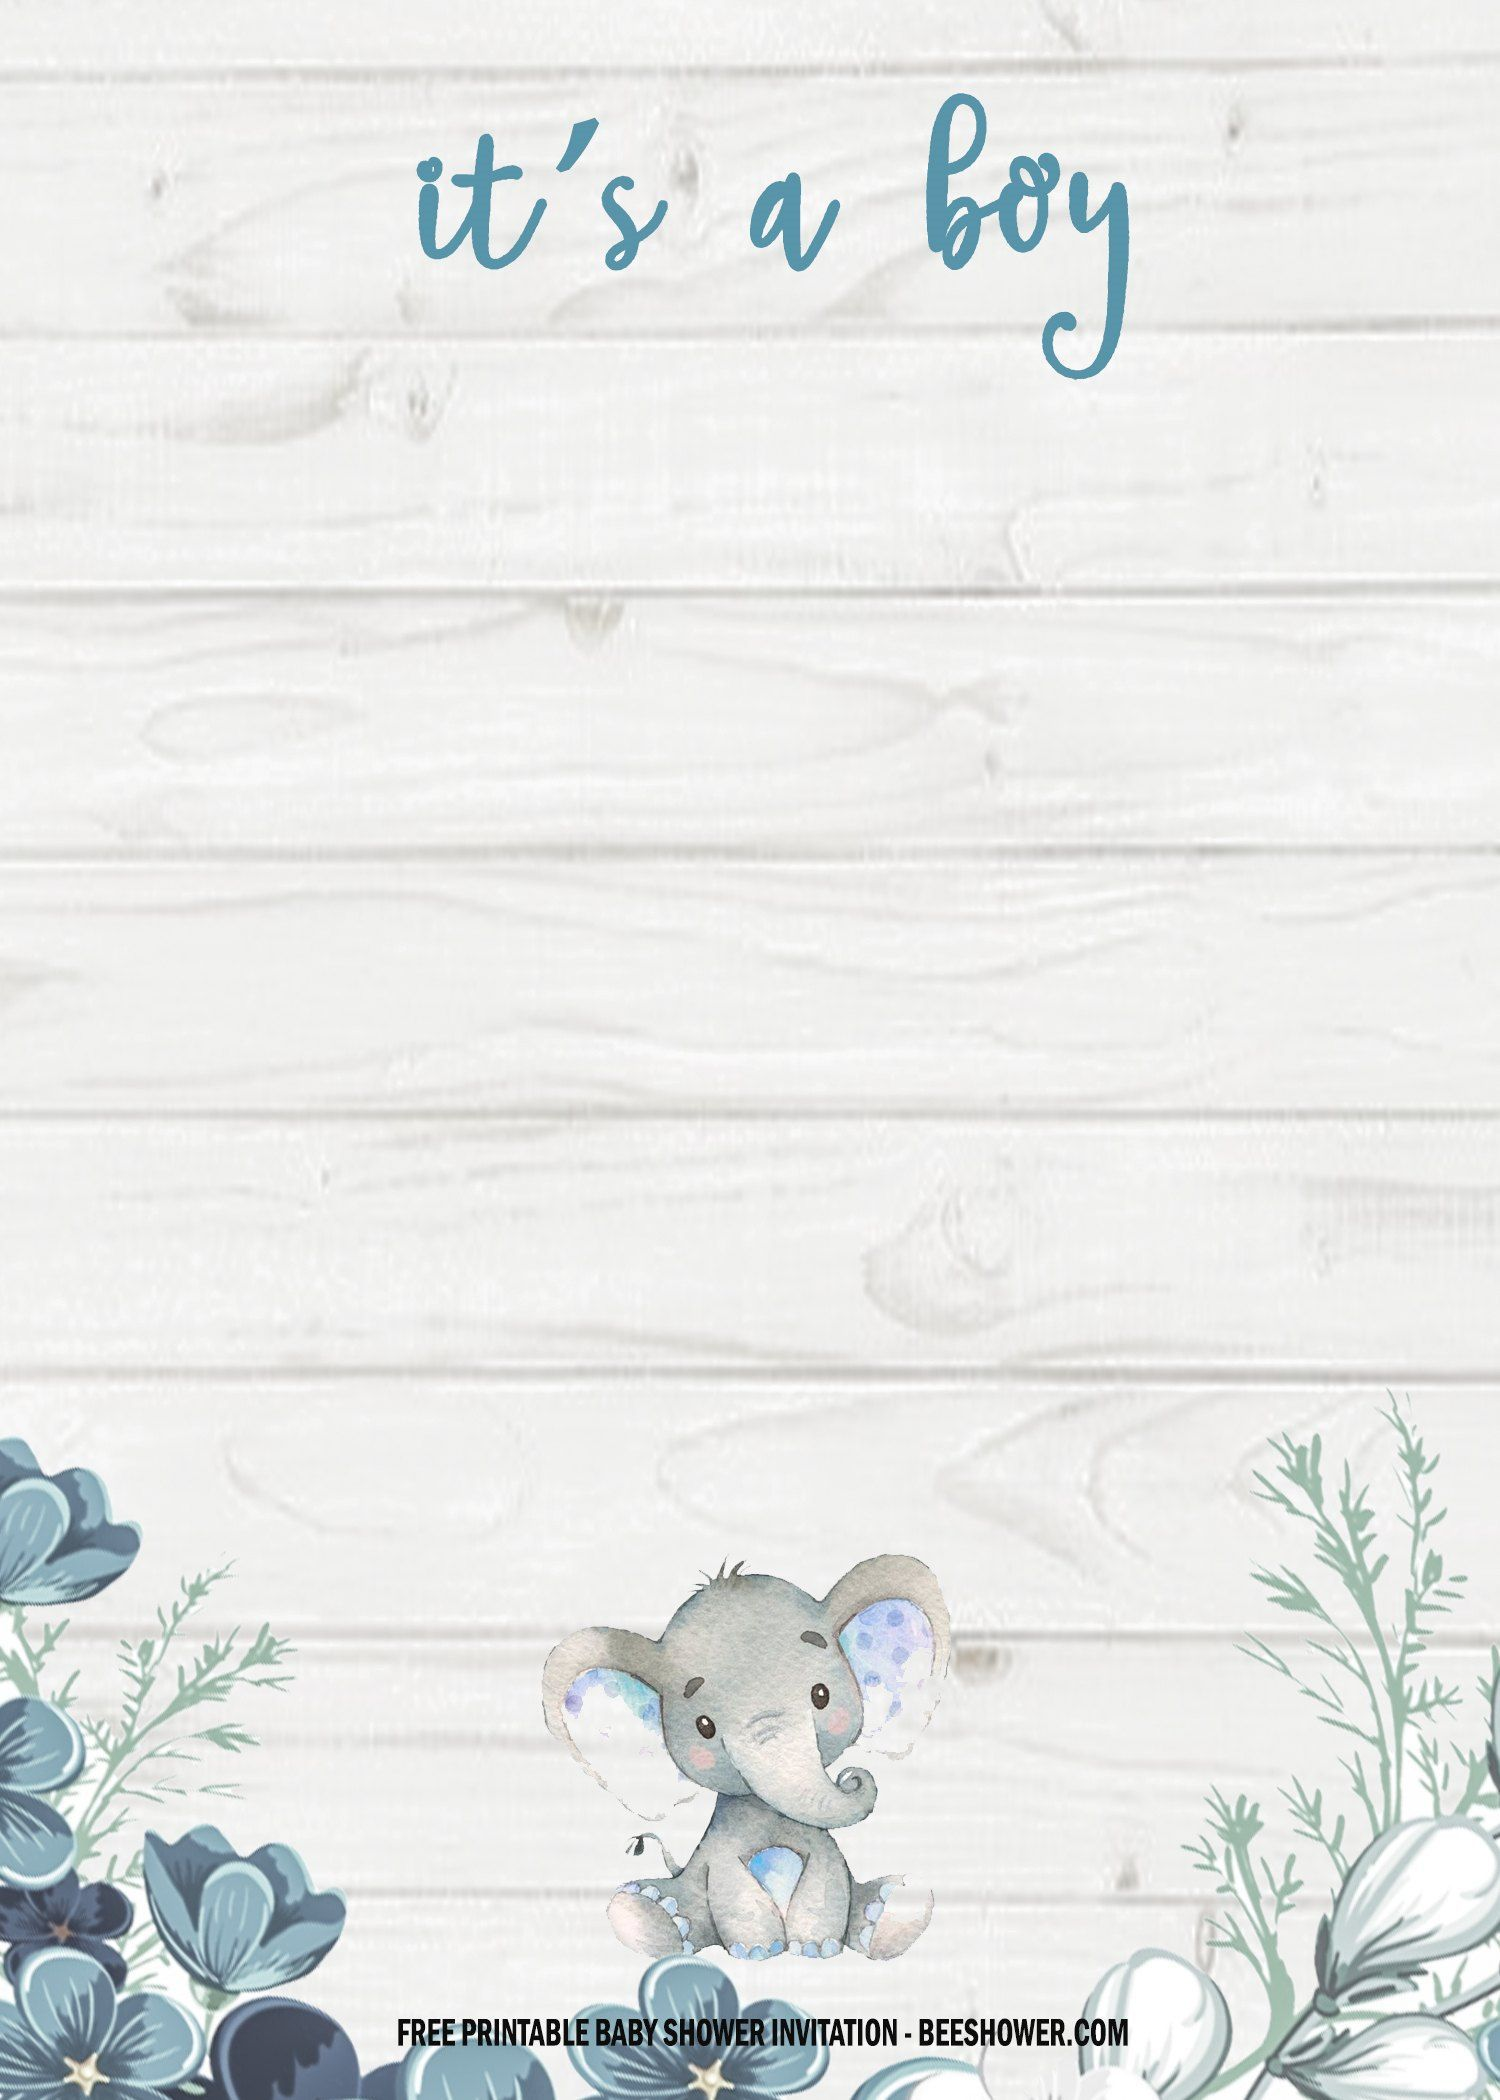 005 Formidable Elephant Girl Baby Shower Invitation Template Inspiration  Templates PinkFull